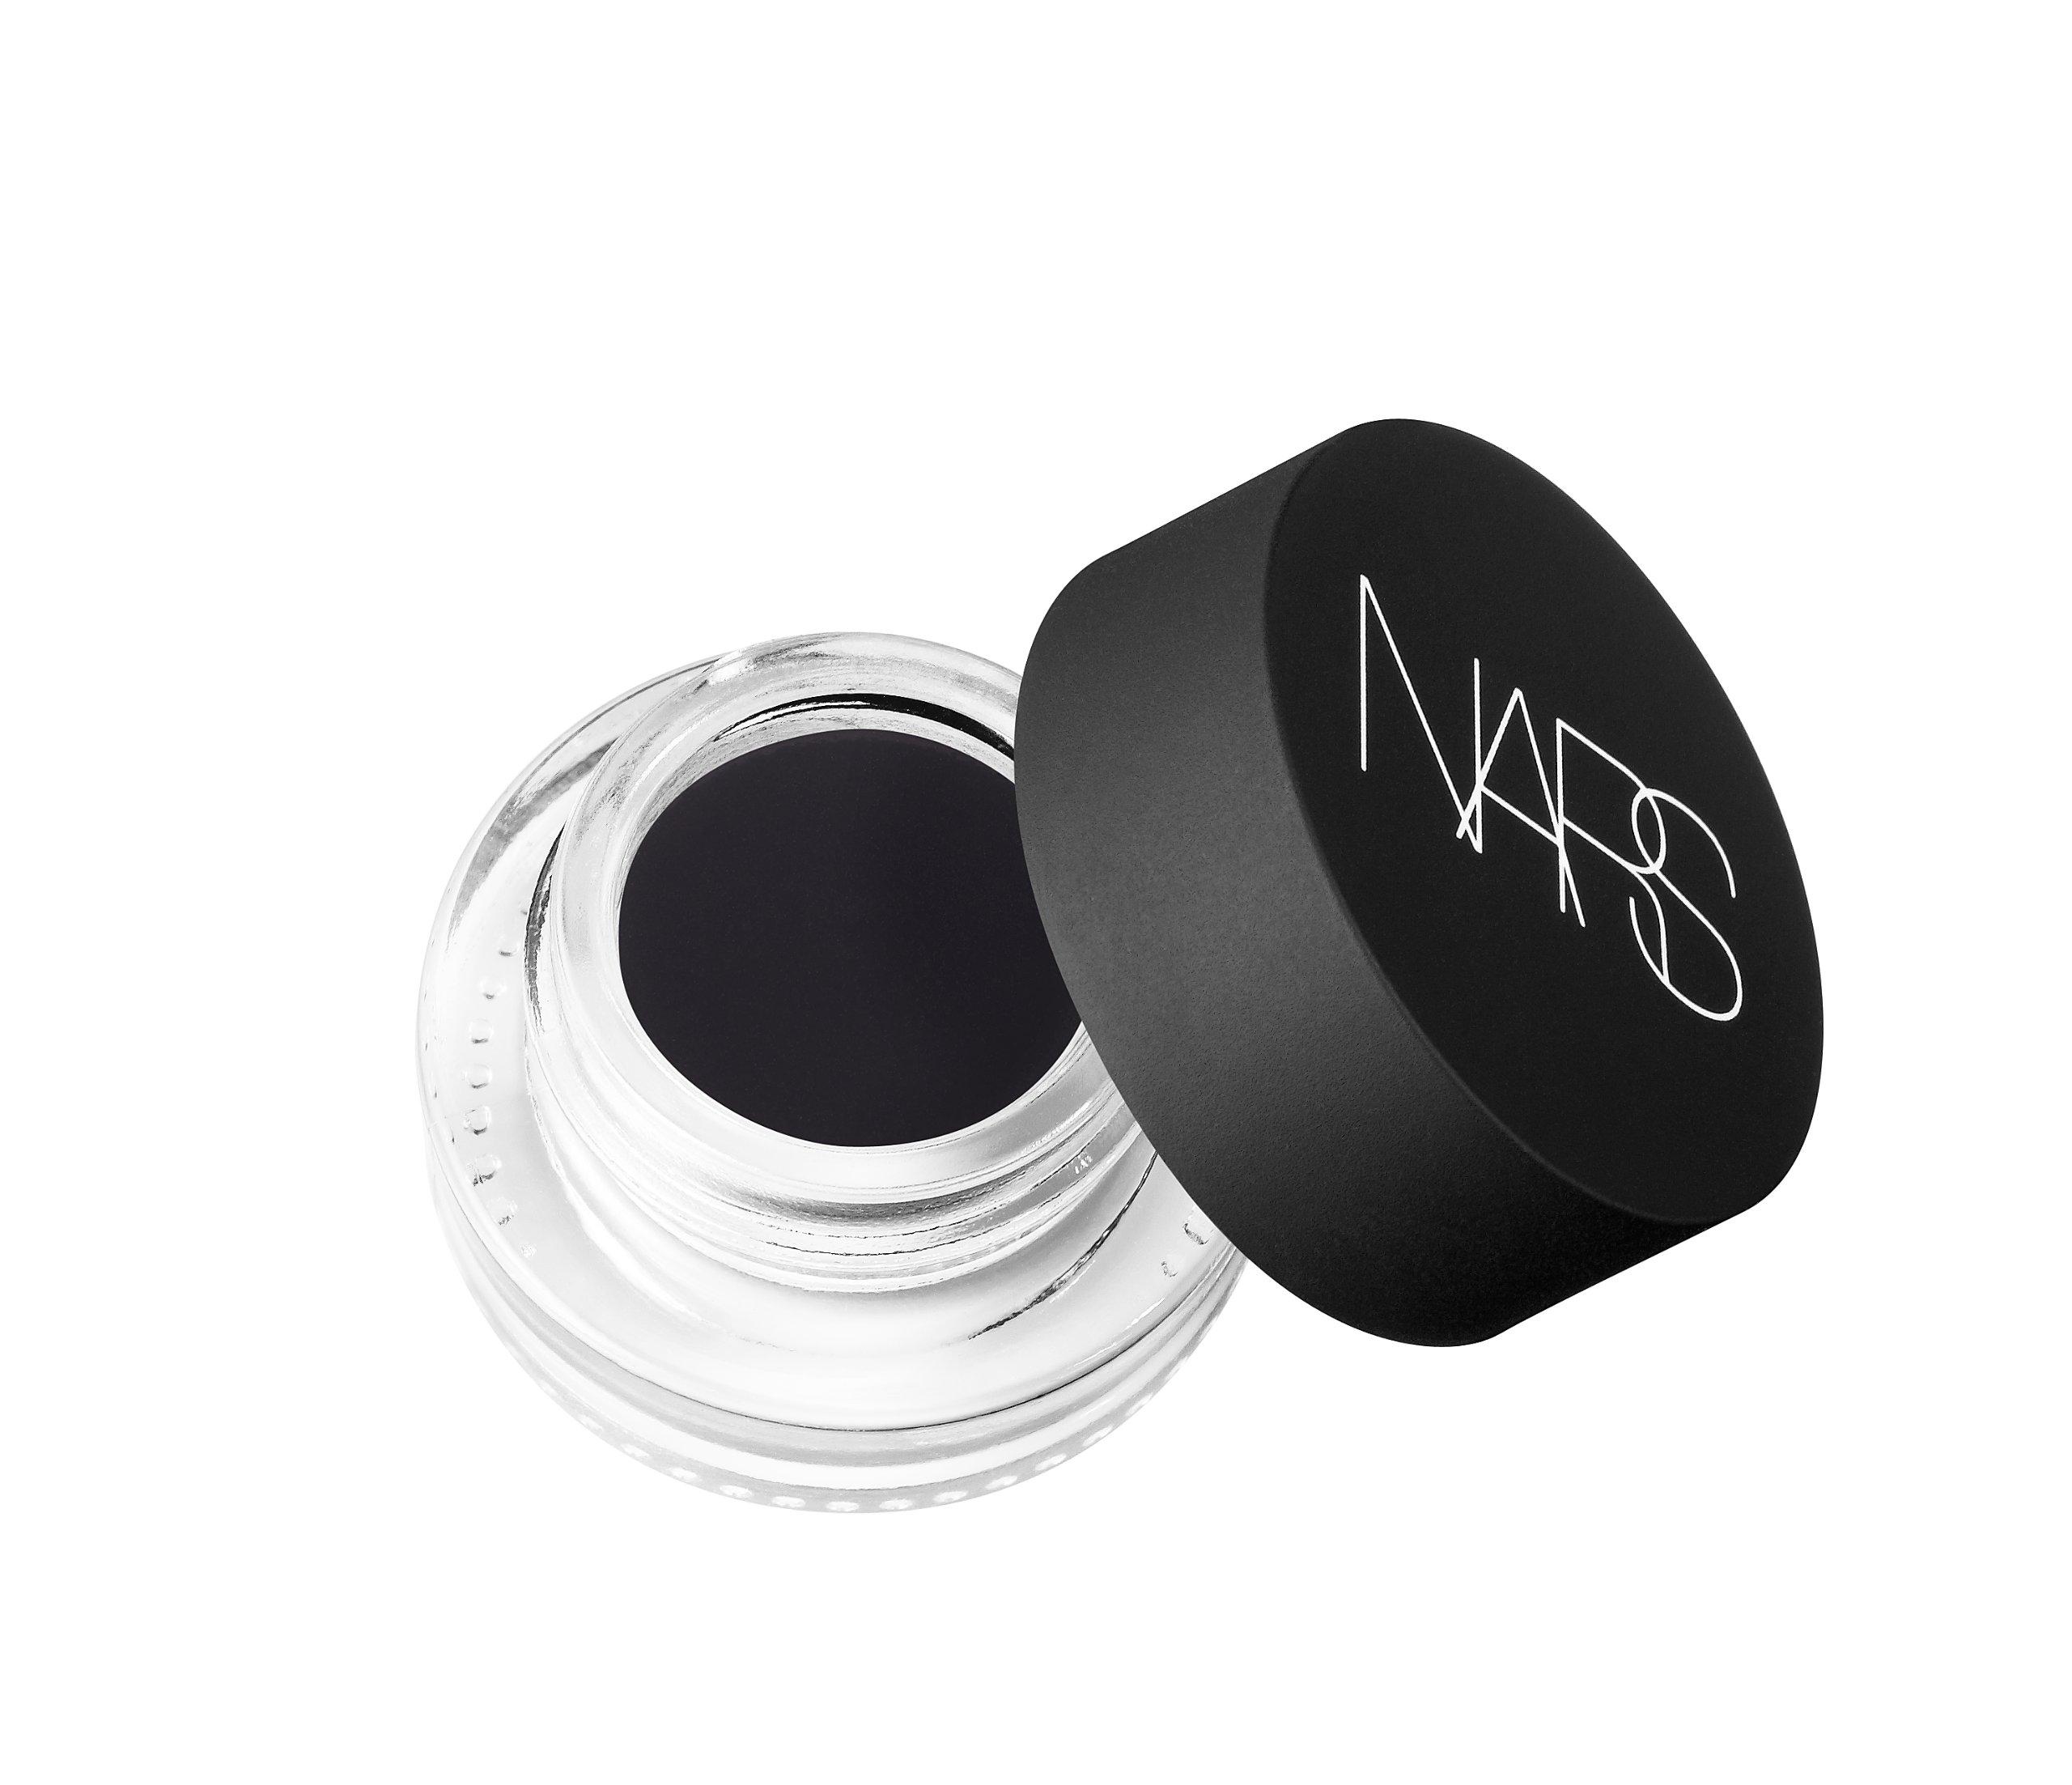 NARS Eye Paint, Black Valley